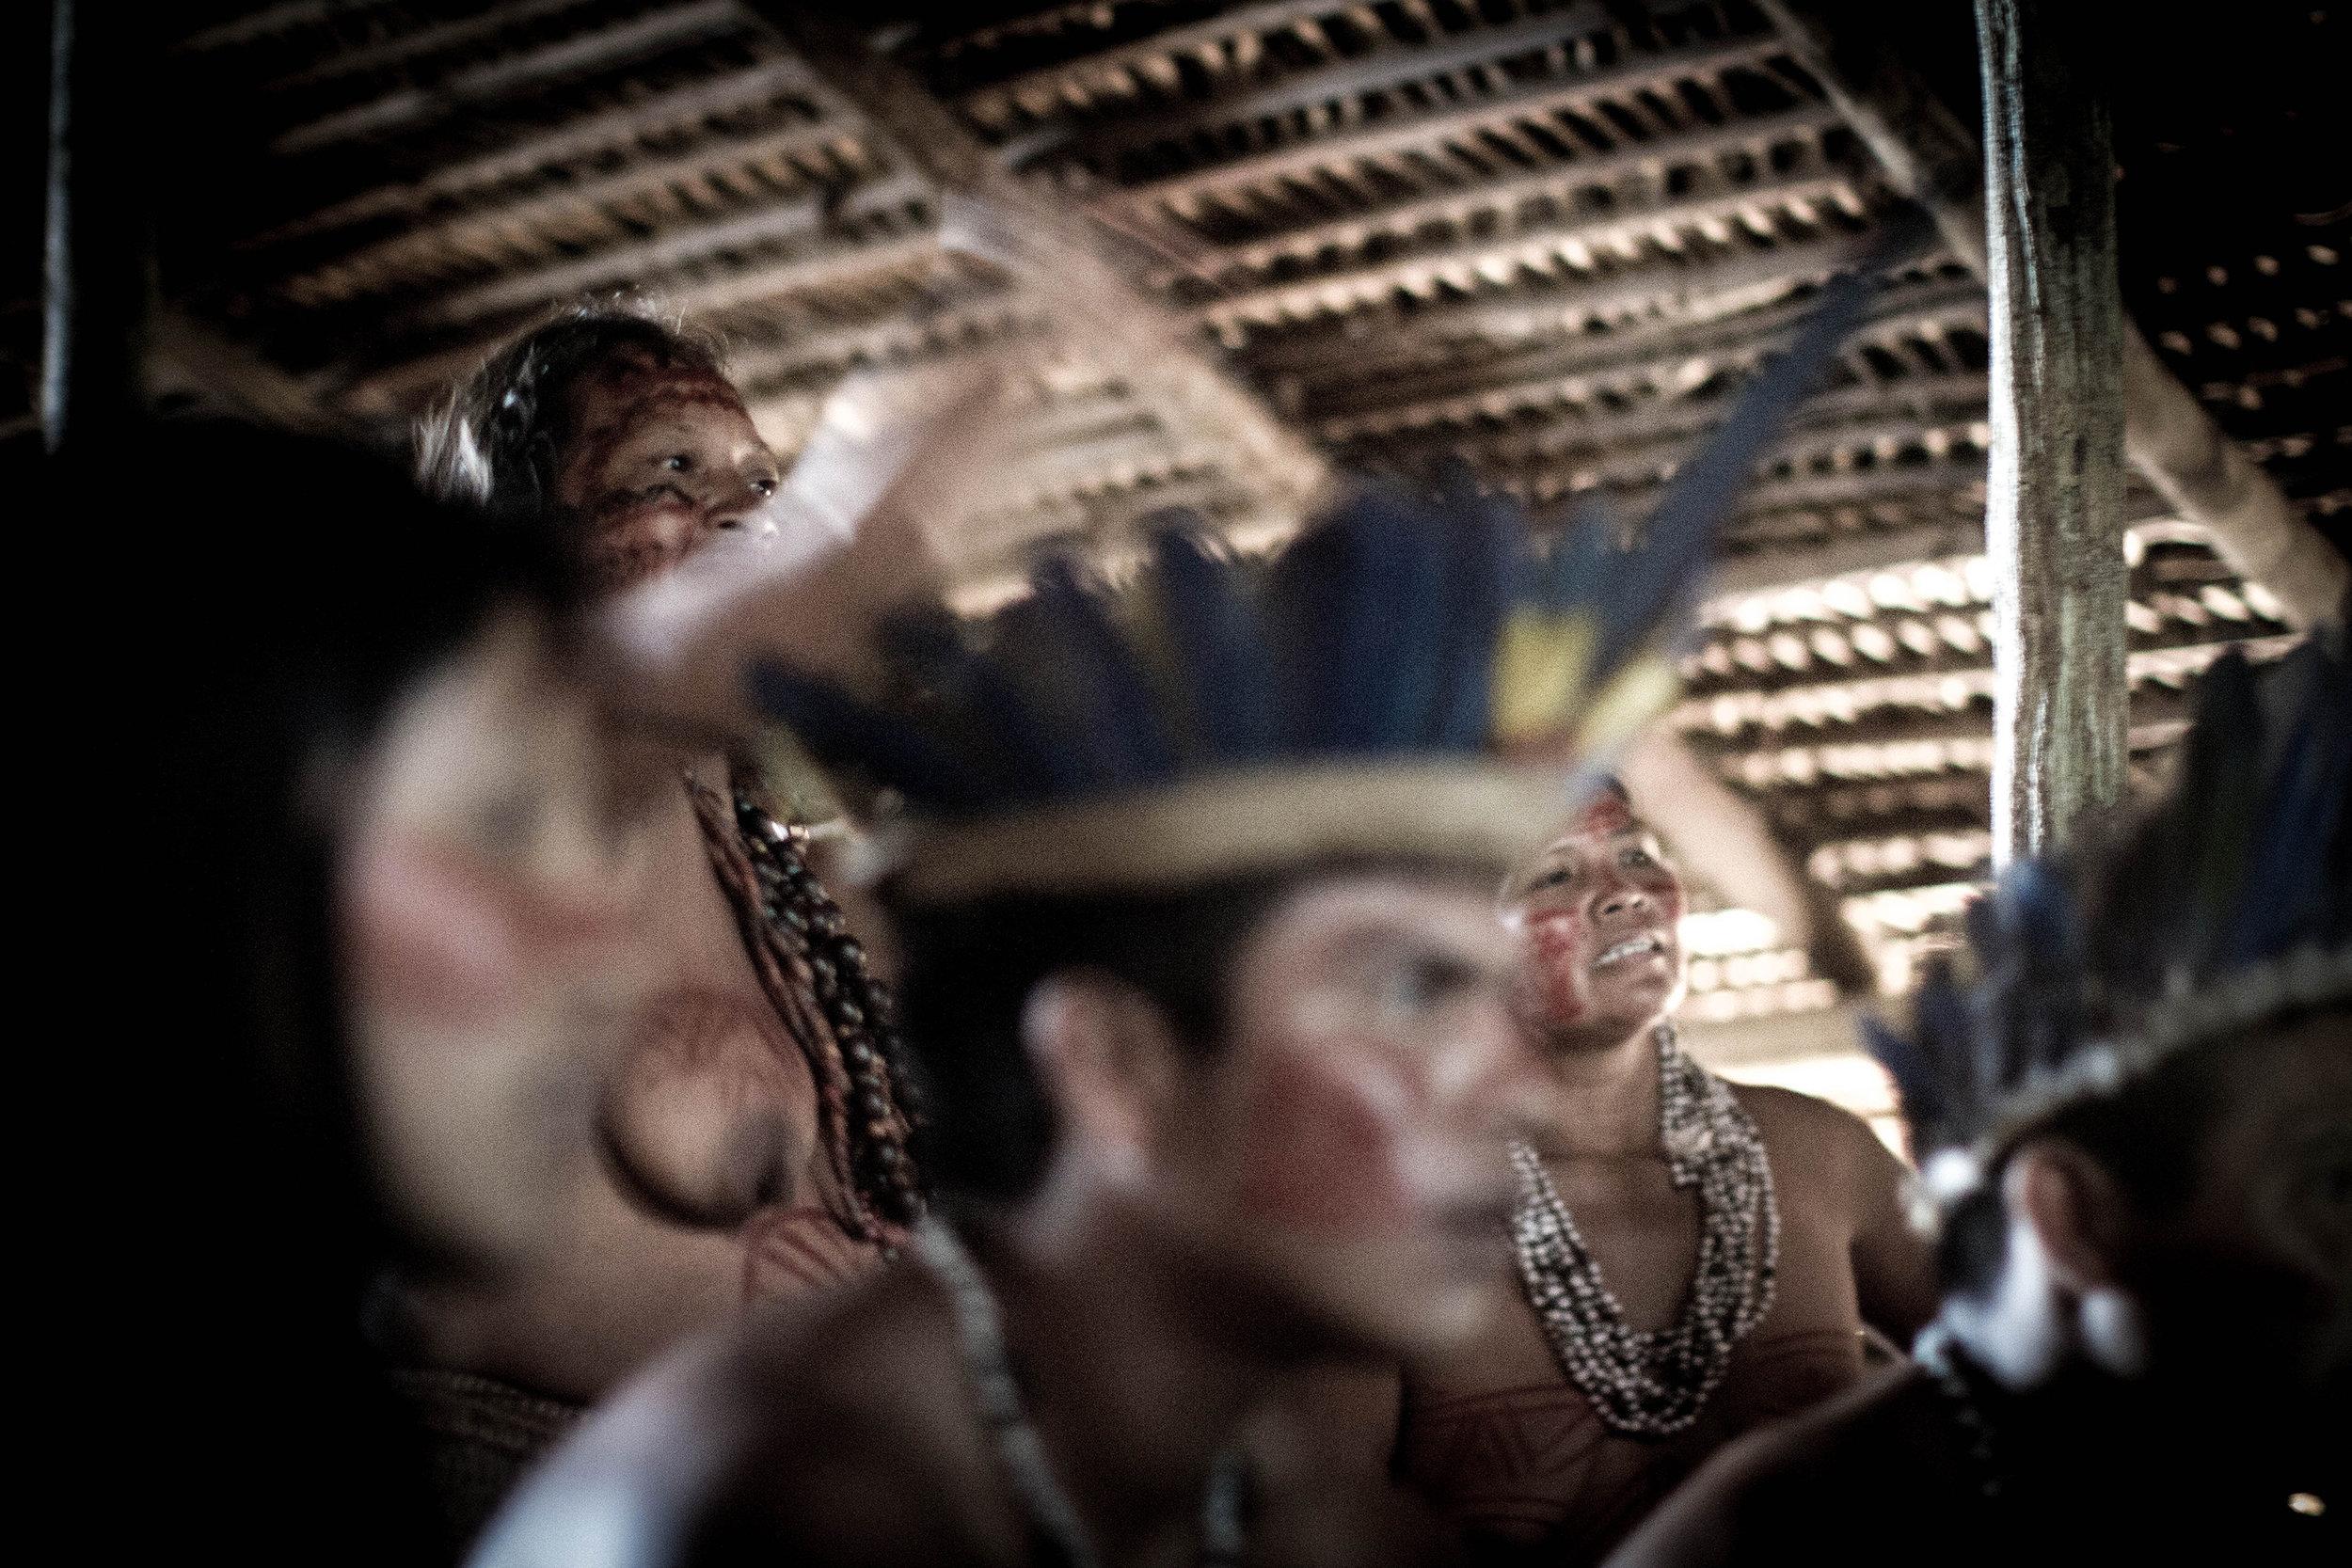 f_pedro bayeux tribe game 29.jpg